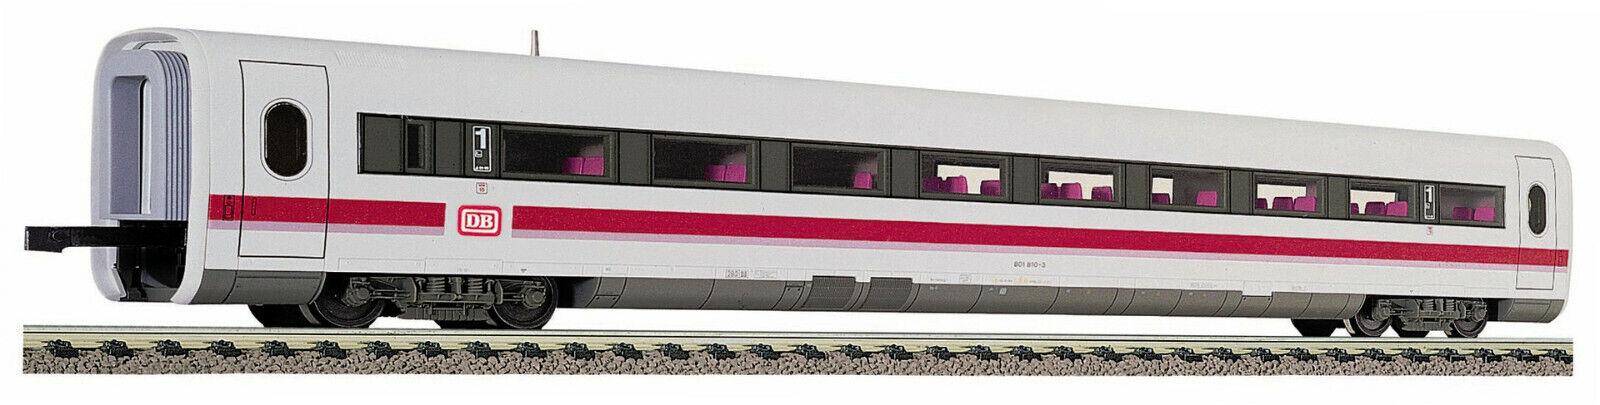 Fleischuomon 444101 Ice Vagone 1 classee 801 8491 DB Ep.v Nuovo